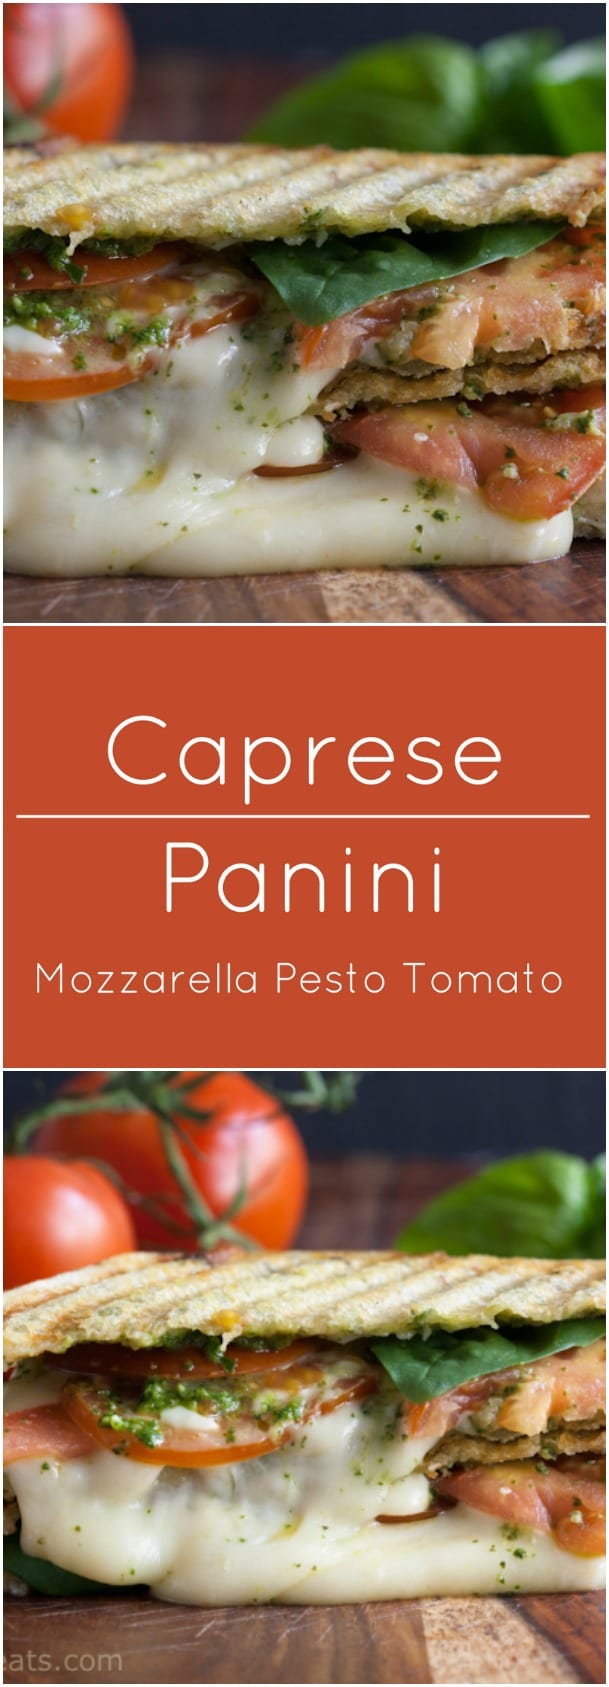 Grilled Caprese Panini with mozarella, pesto and tomatoes.